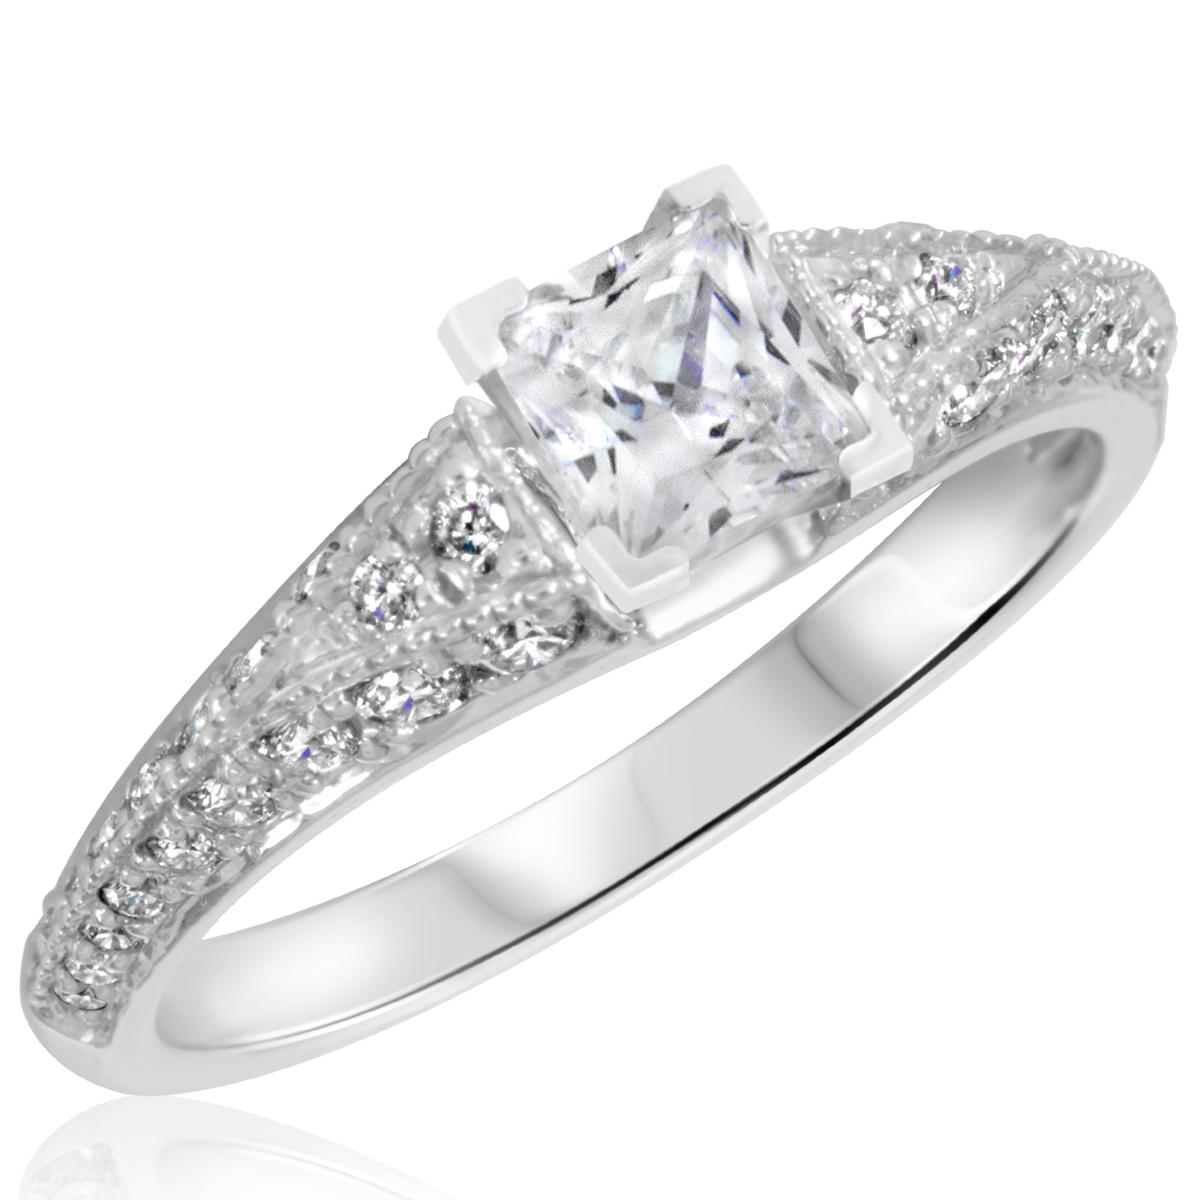 1 1/4 CT. T.W. Diamond Ladies Engagement Ring 14K White Gold- Size 8